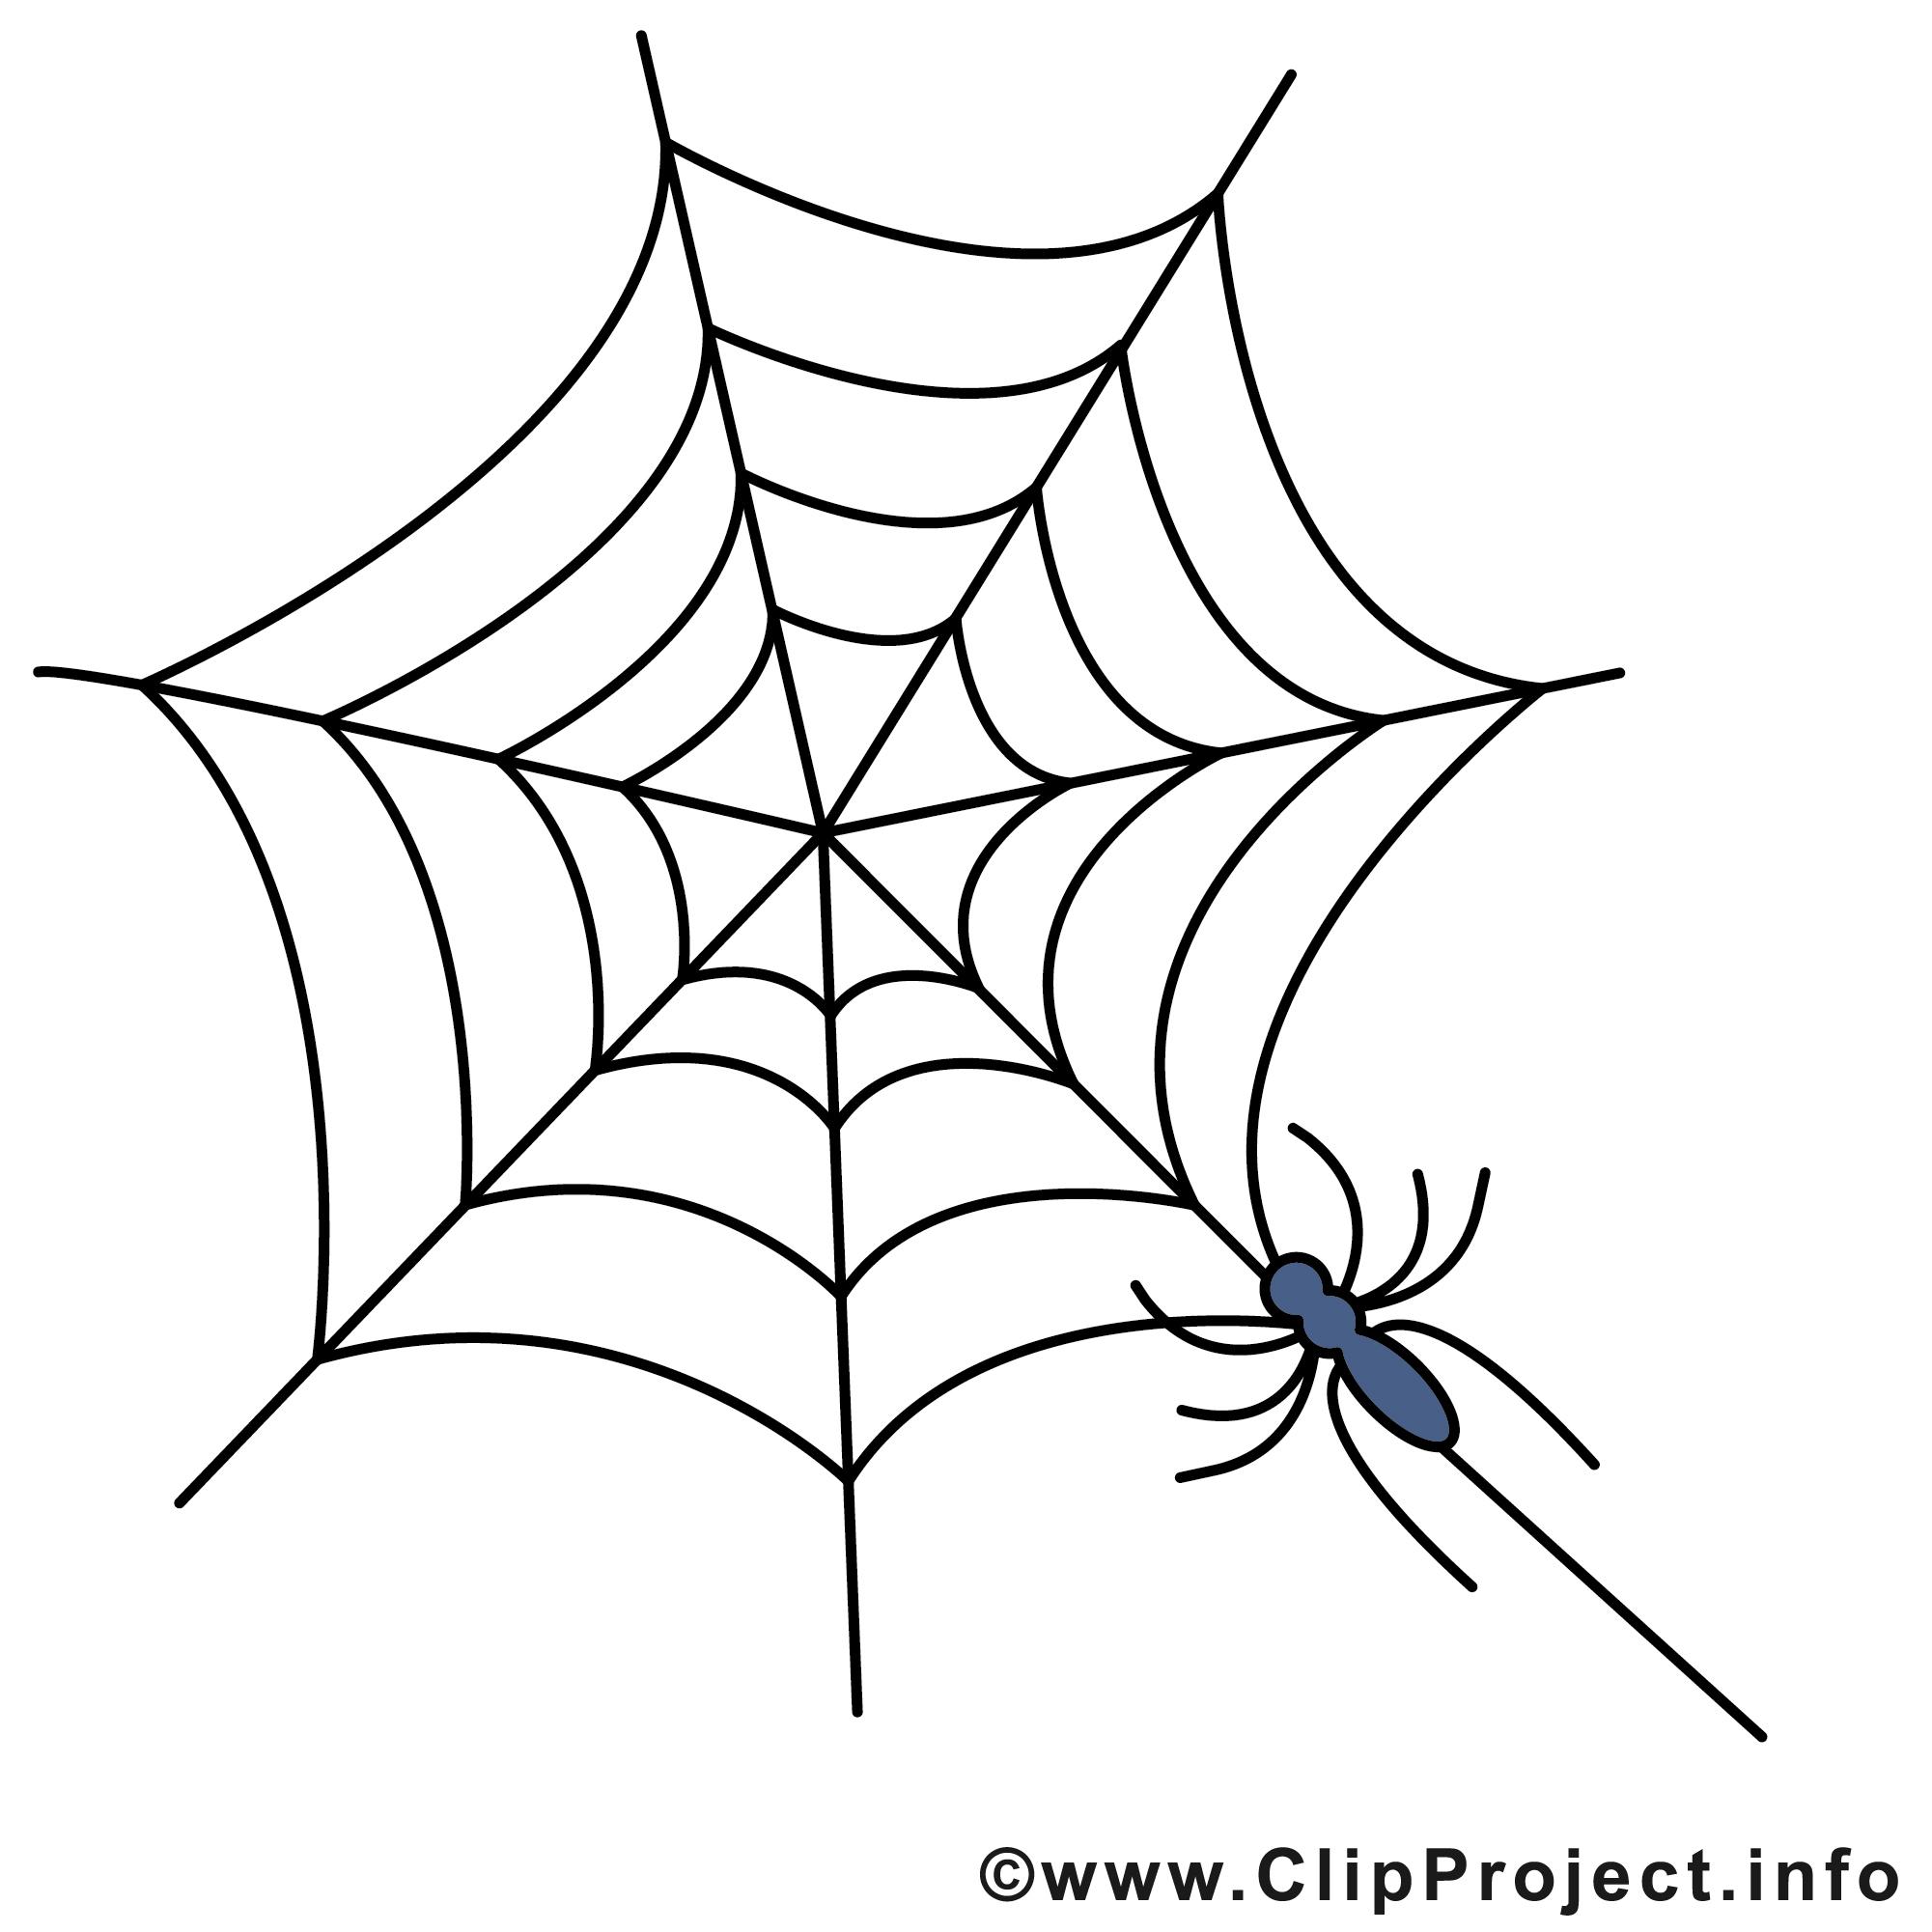 Toile D'araignée Image - Halloween Clipart - Halloween tout Toile D Araignée Dessin